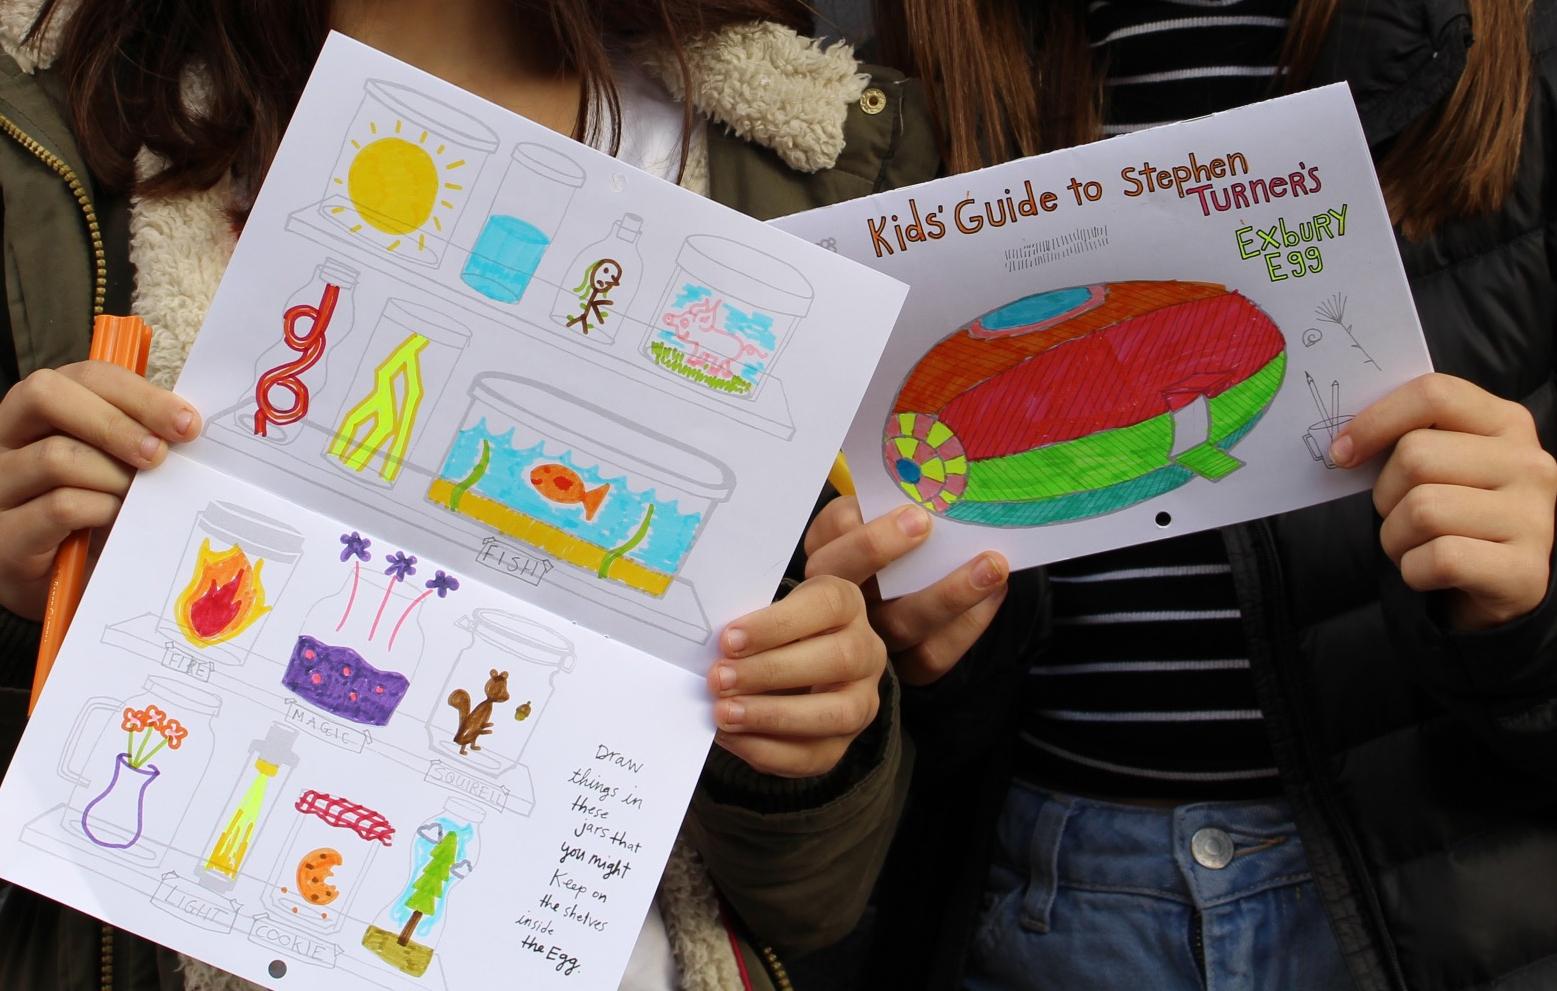 Kids' Guide to Stephen Turner's Exbury Egg, Trinity Buoy Wharf, January 2017